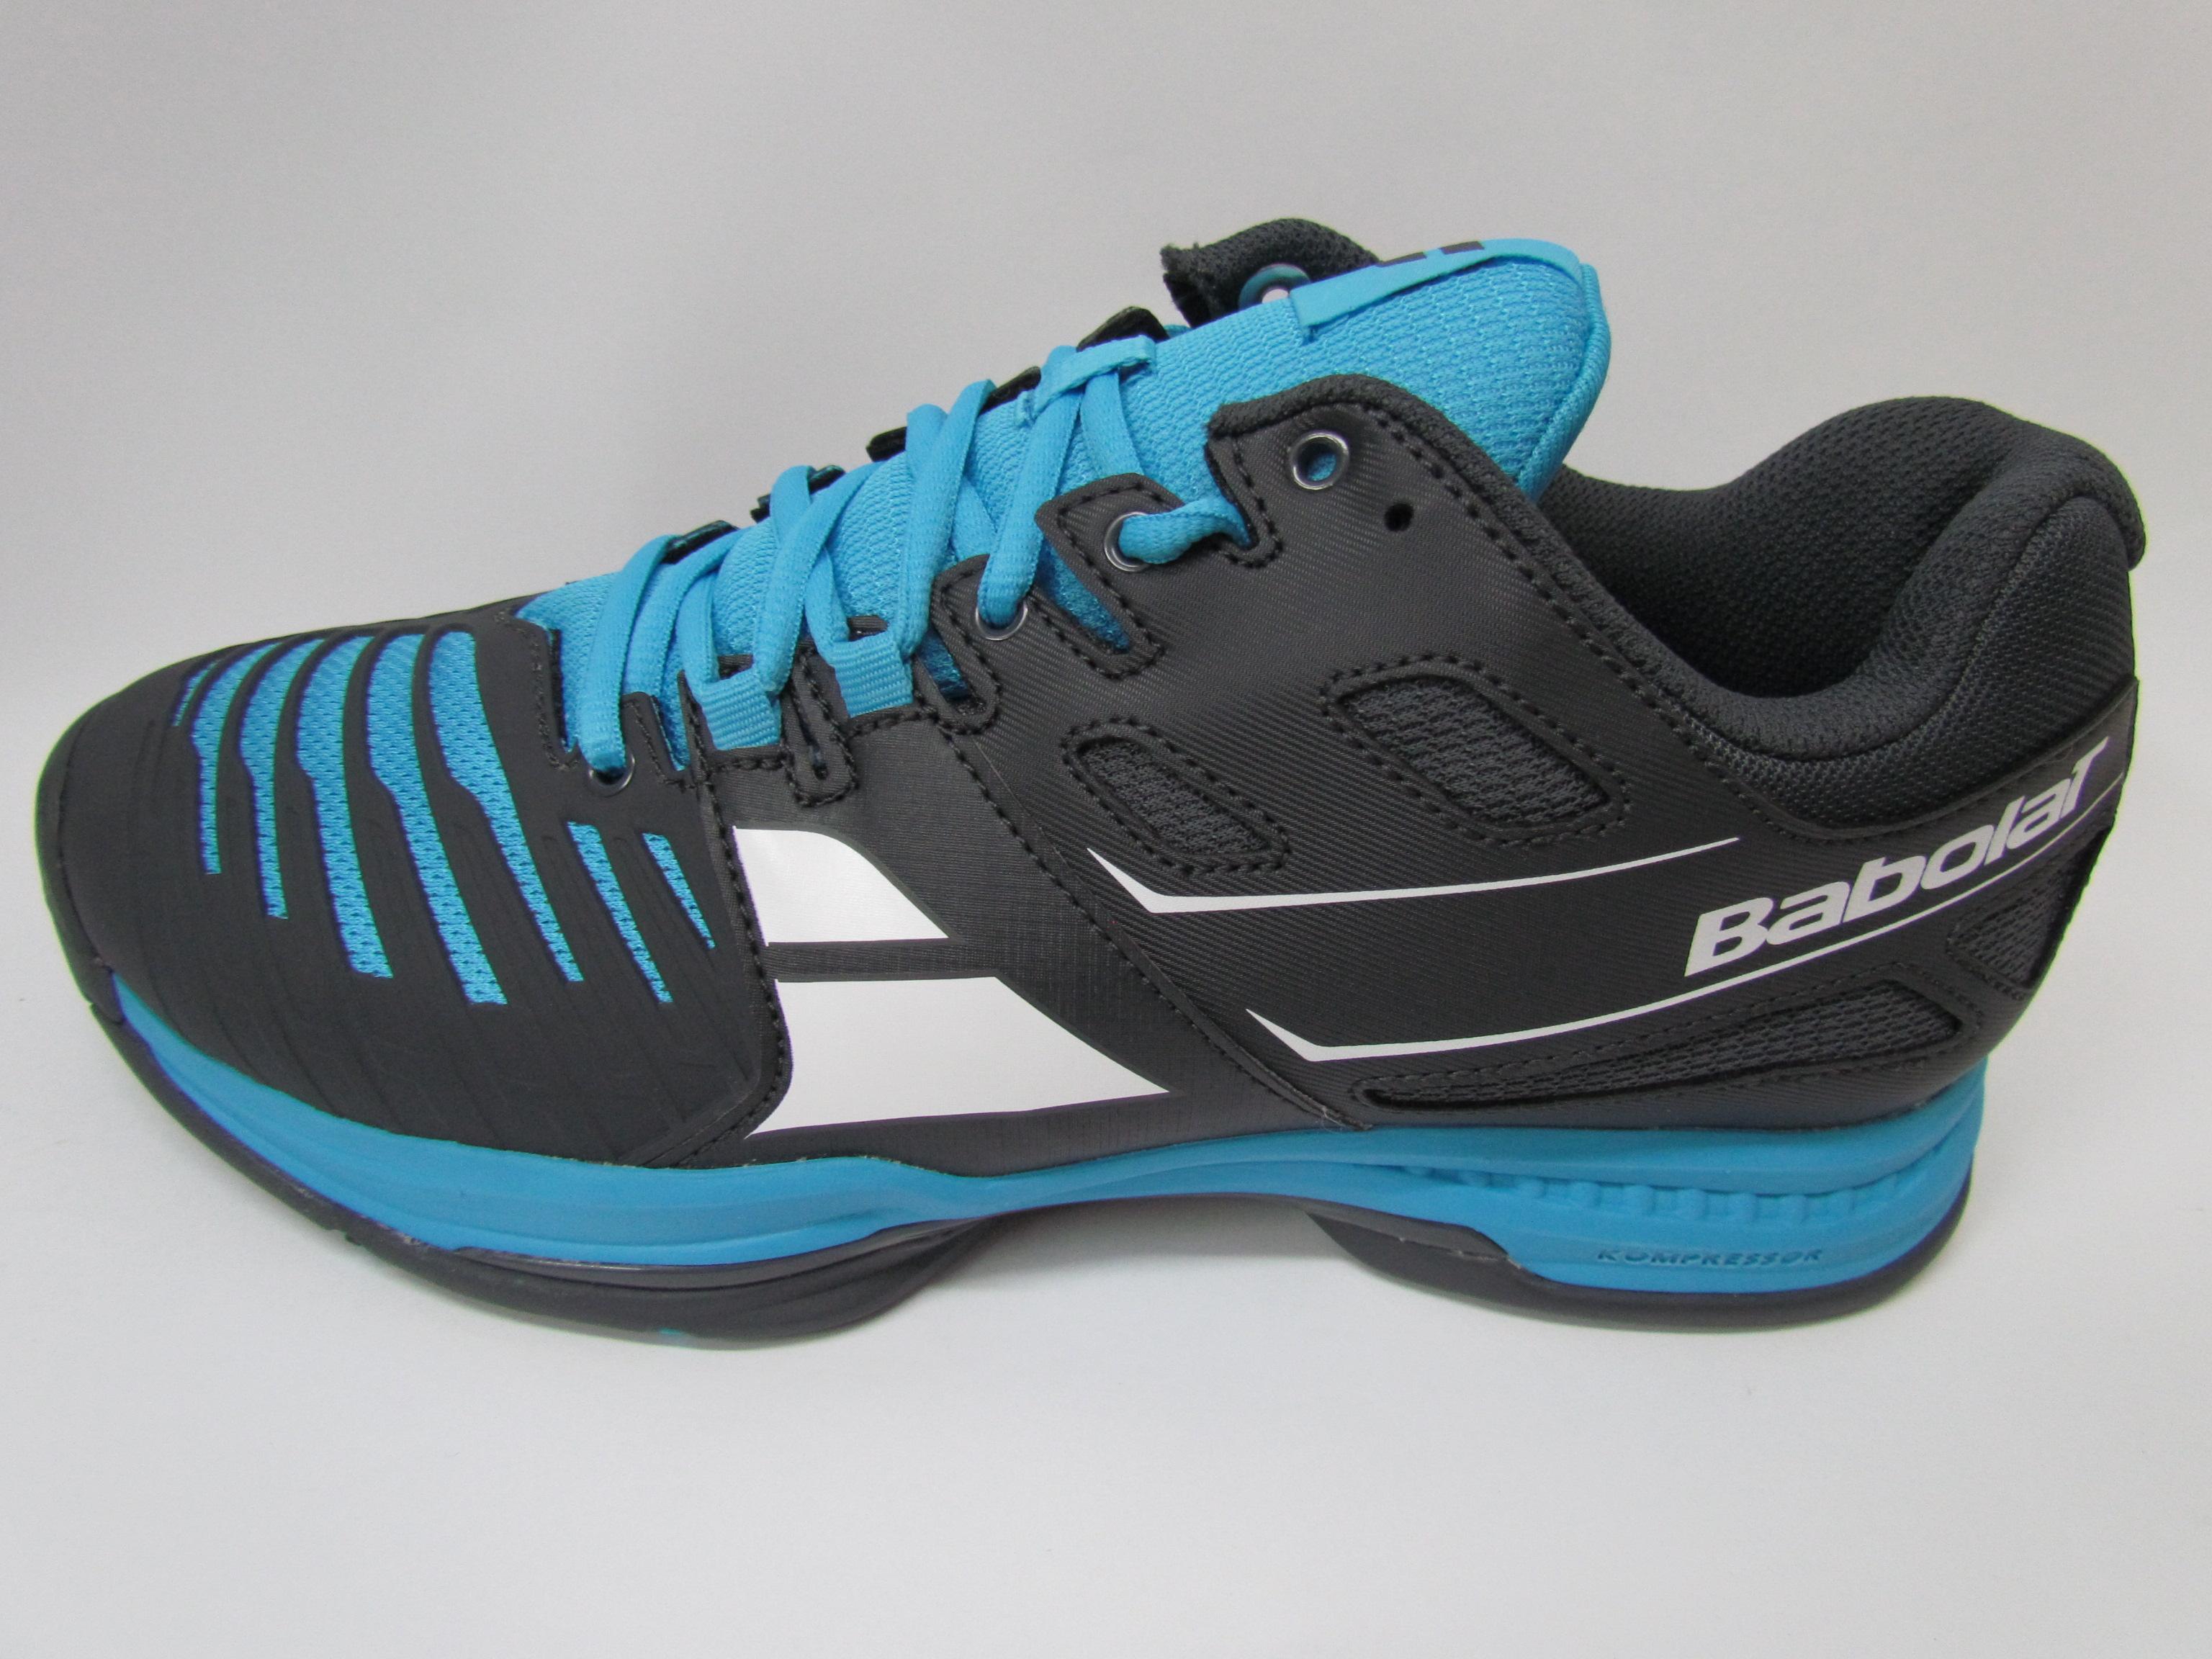 Babolat 專業男網球鞋2016新款